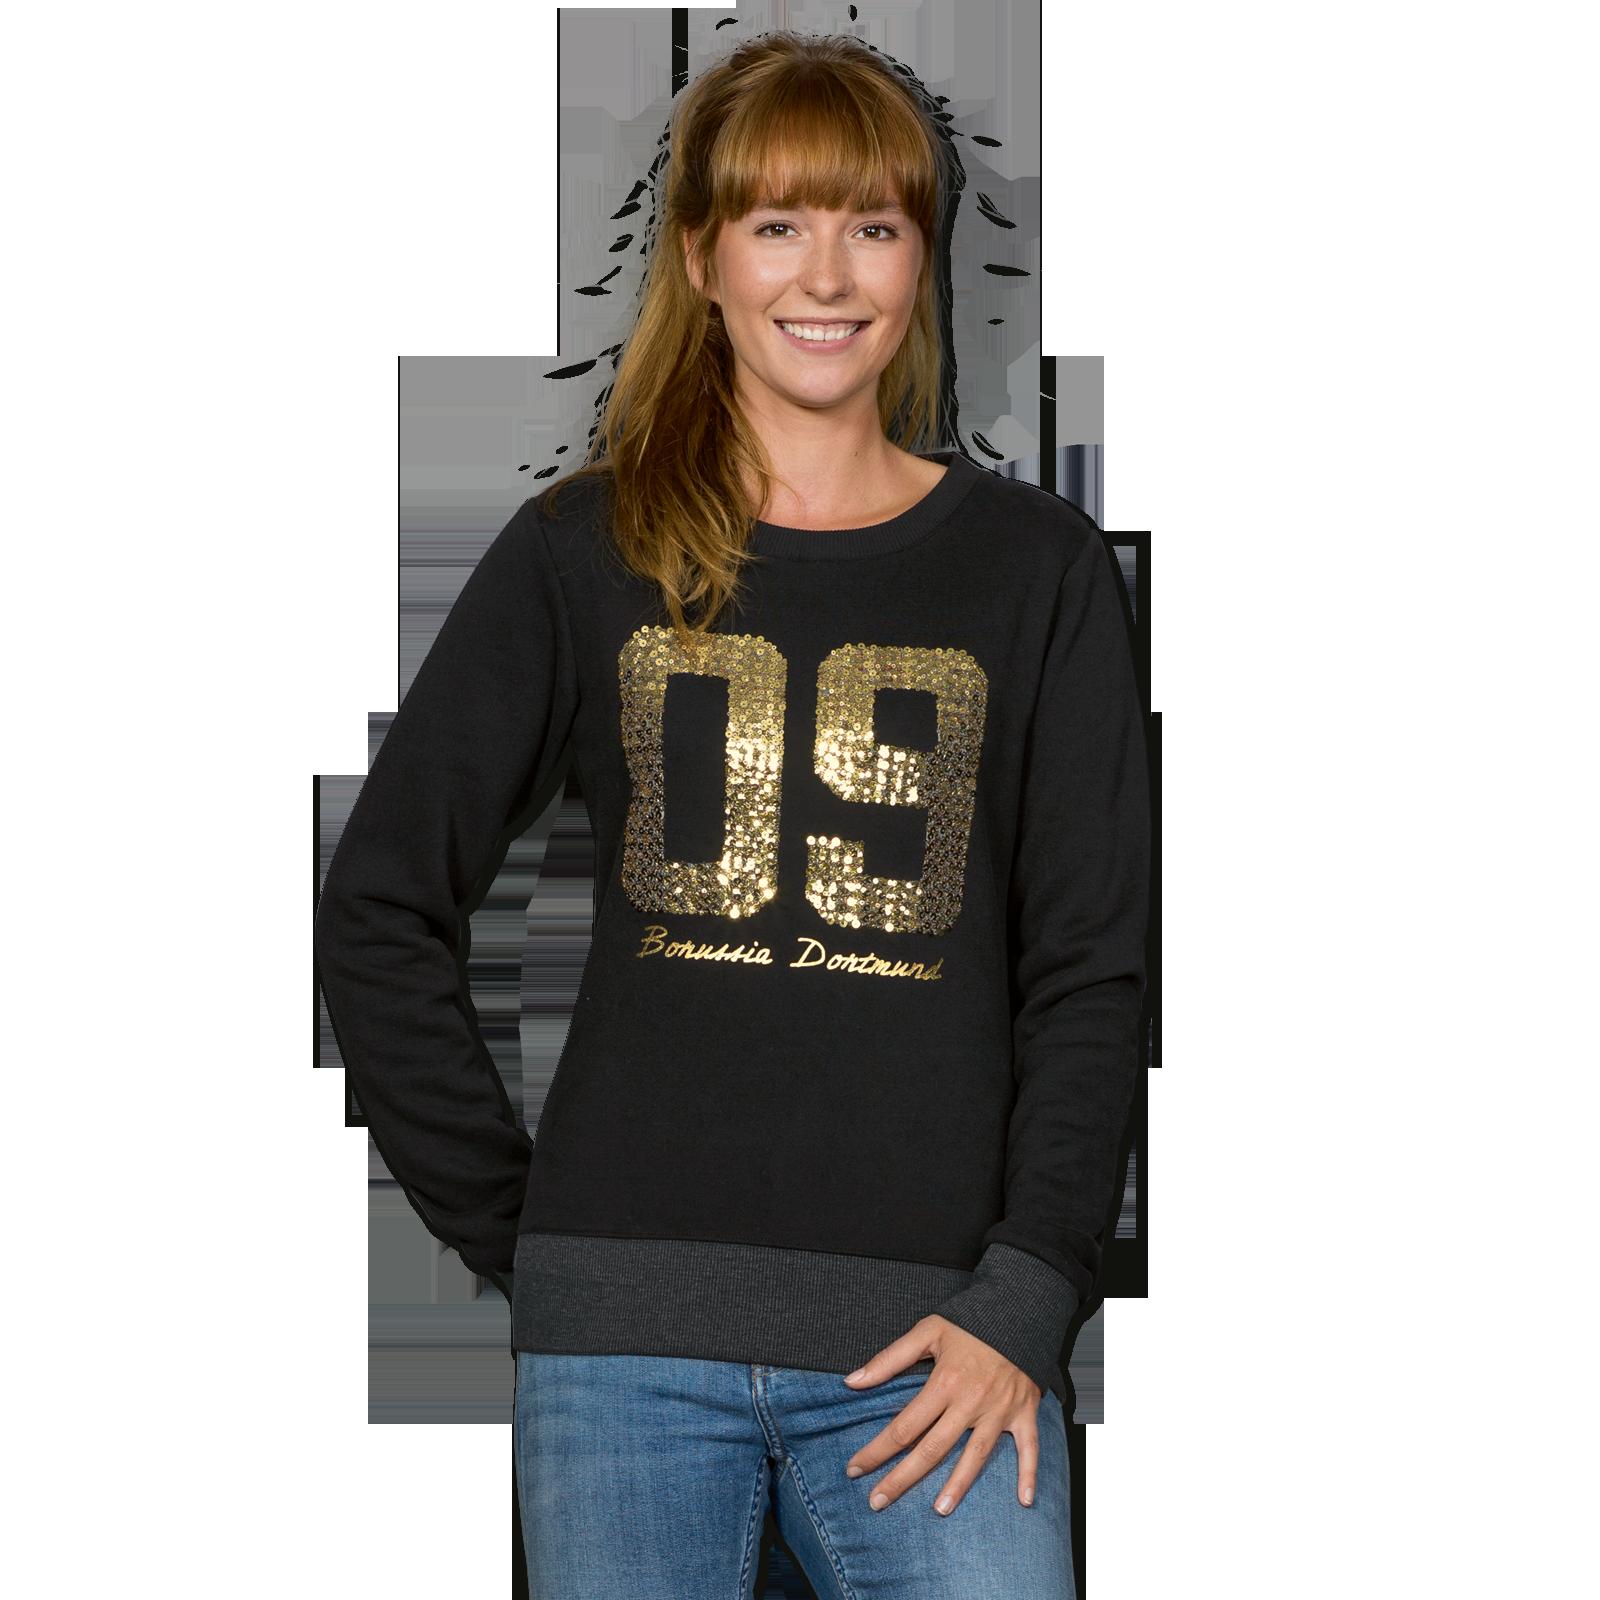 09 sweatshirt mit pailletten f r frauen pullover jacken damen offizieller bvb online fanshop. Black Bedroom Furniture Sets. Home Design Ideas